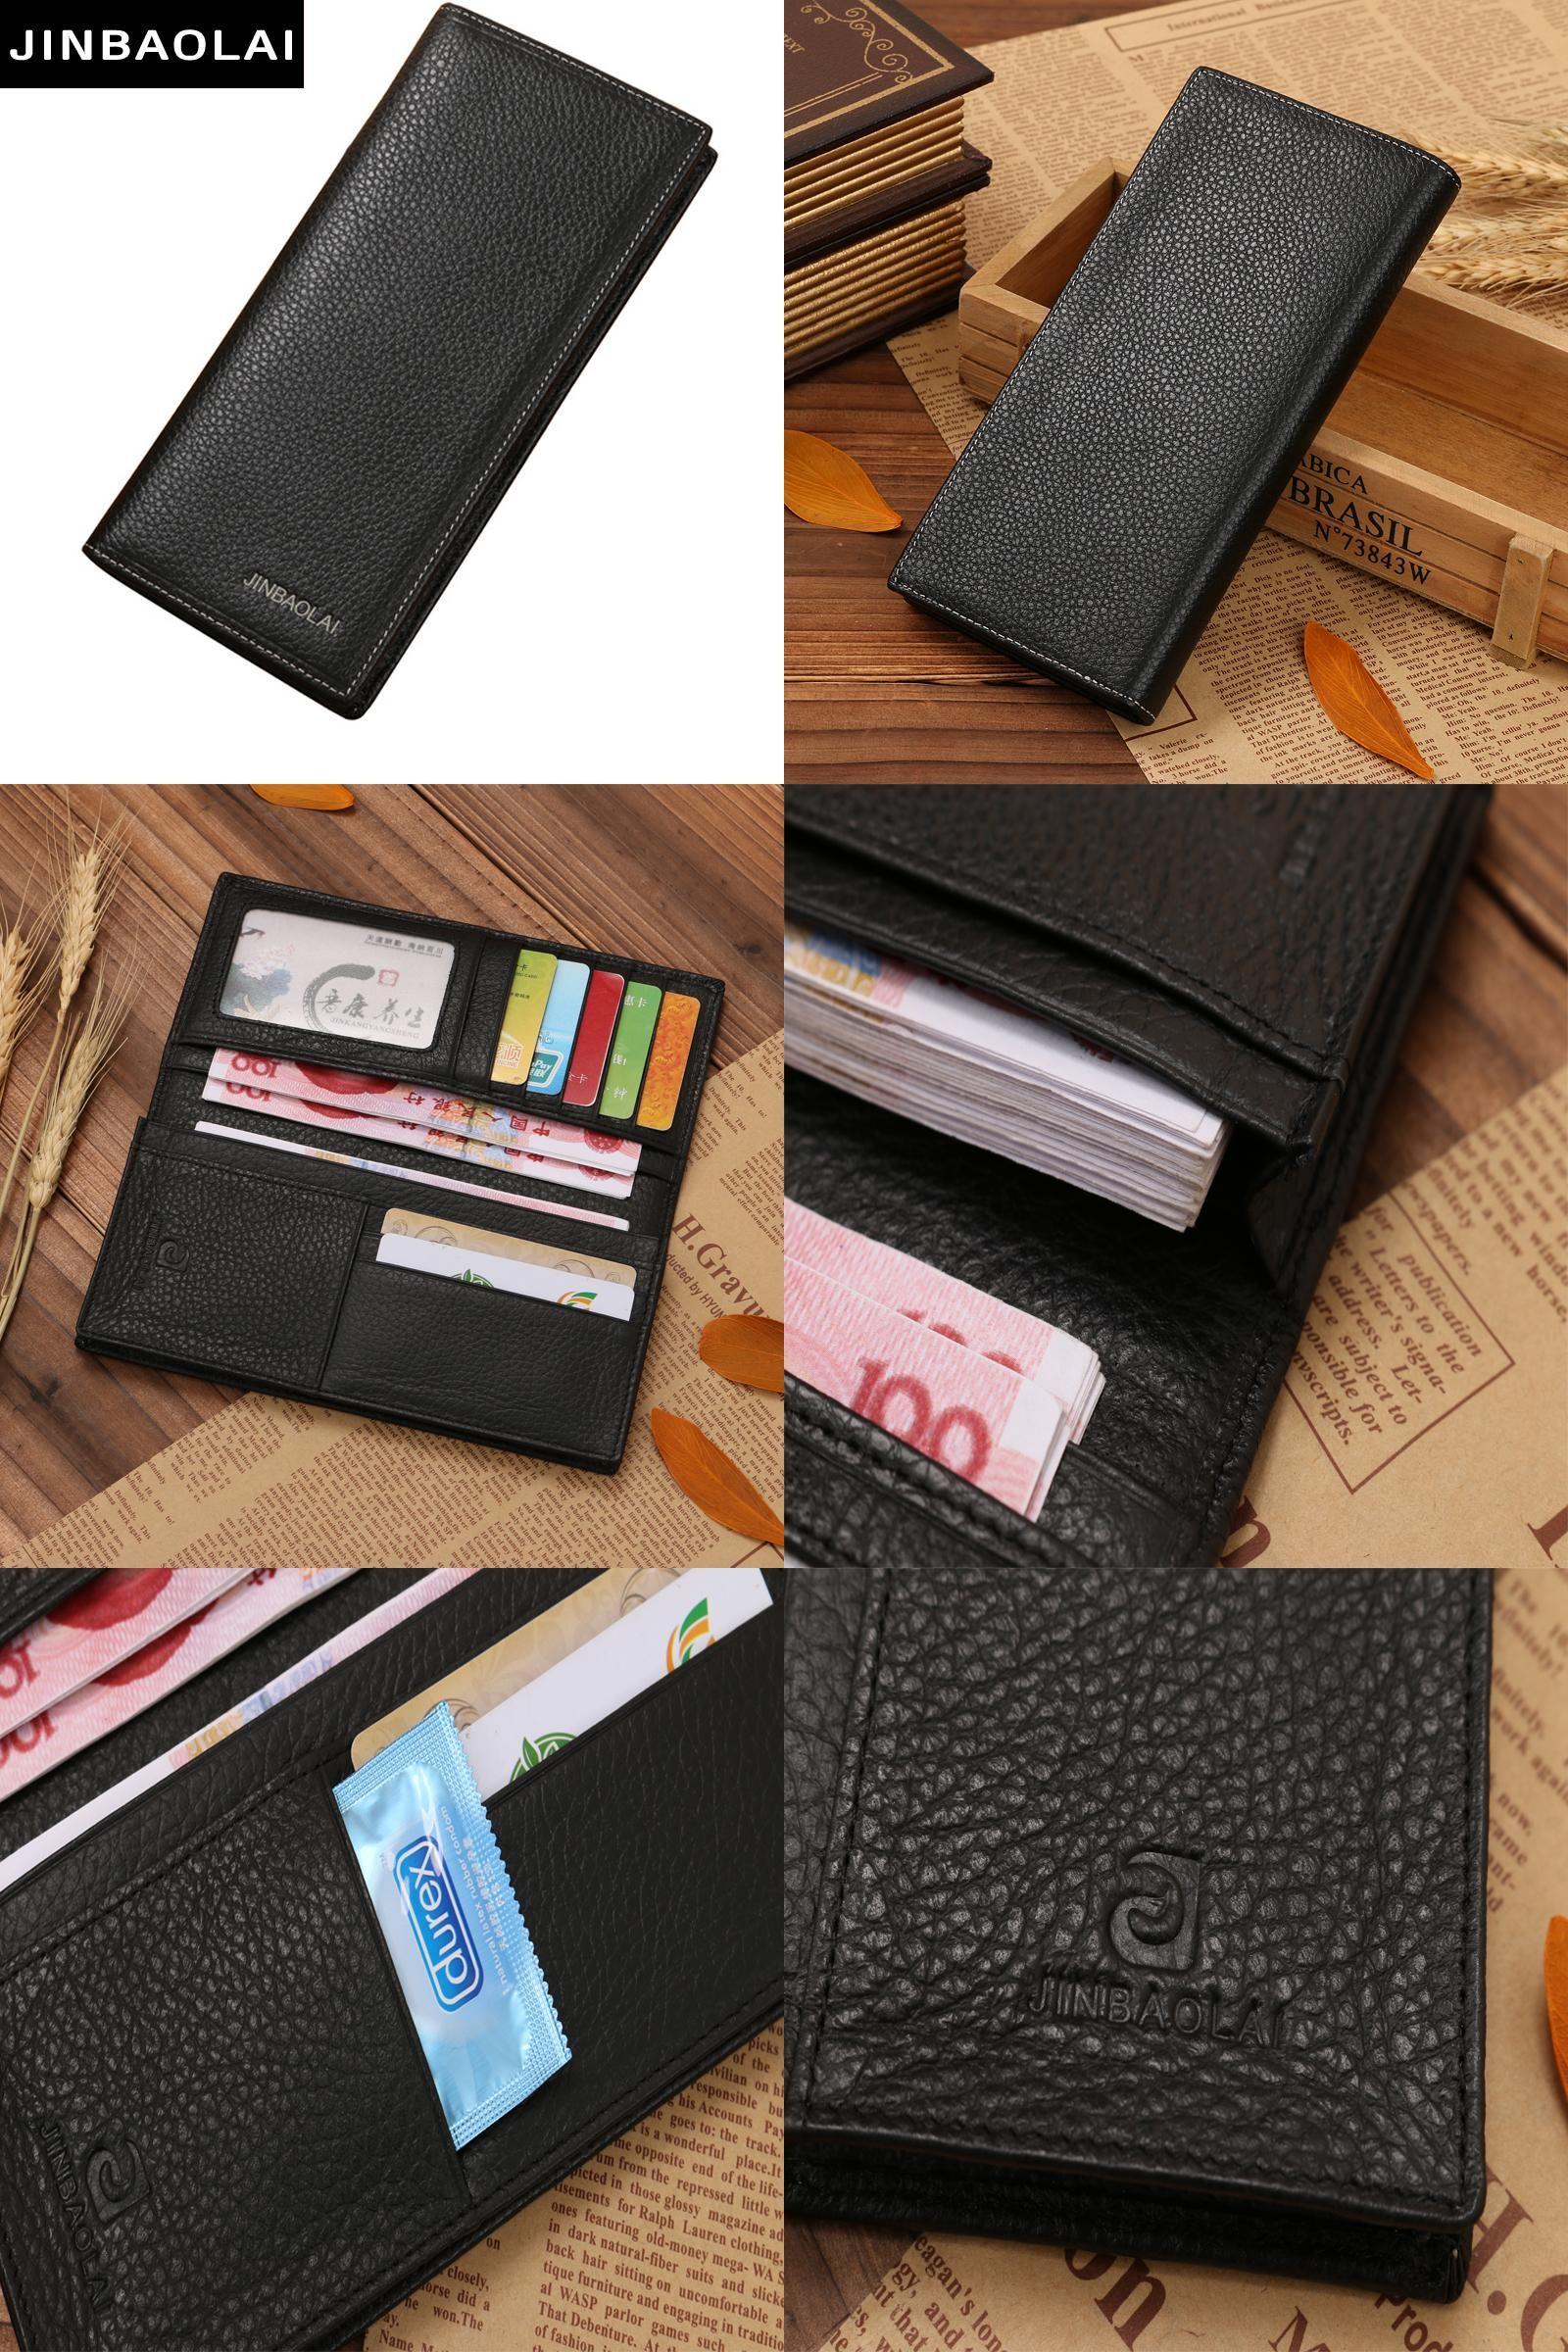 63254d3bf174 [Visit to Buy] JINBAOLAI Brand Men Wallet Genuine Leather Long clutch  wallets for men Cowhide Bifold Purse Slim Fashion Male Wallets Carteira  #Advertisement